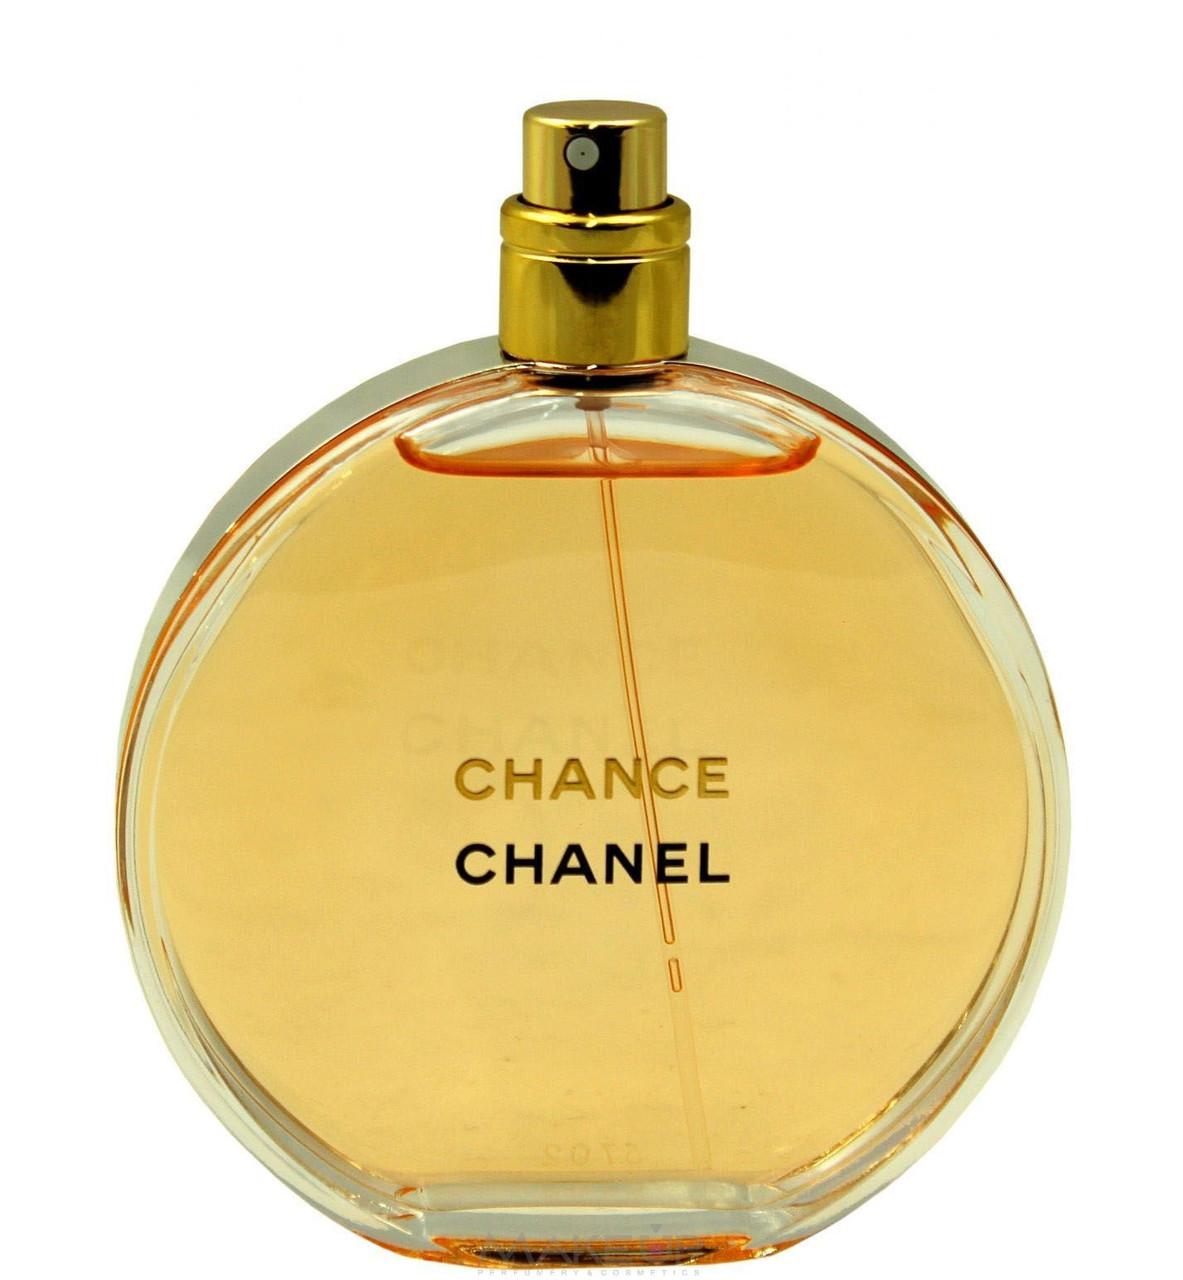 Chanel Chance парфюмированная вода 100 ml. (Тестер Шанель Шанс)